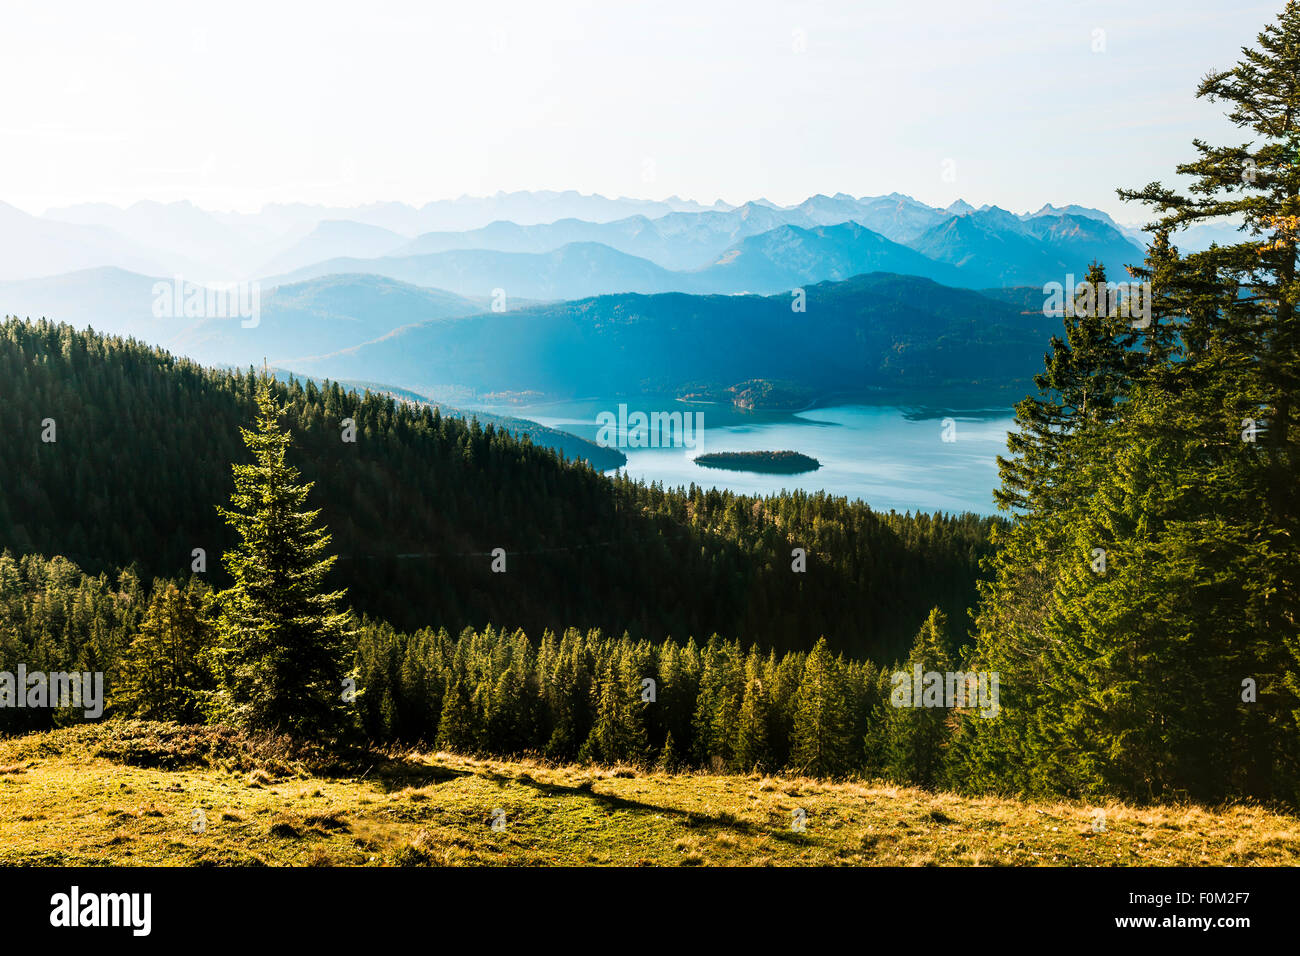 Vista da Jochberg al Lago Walchensee e montagne Karwendel, Baviera, Germania Foto Stock